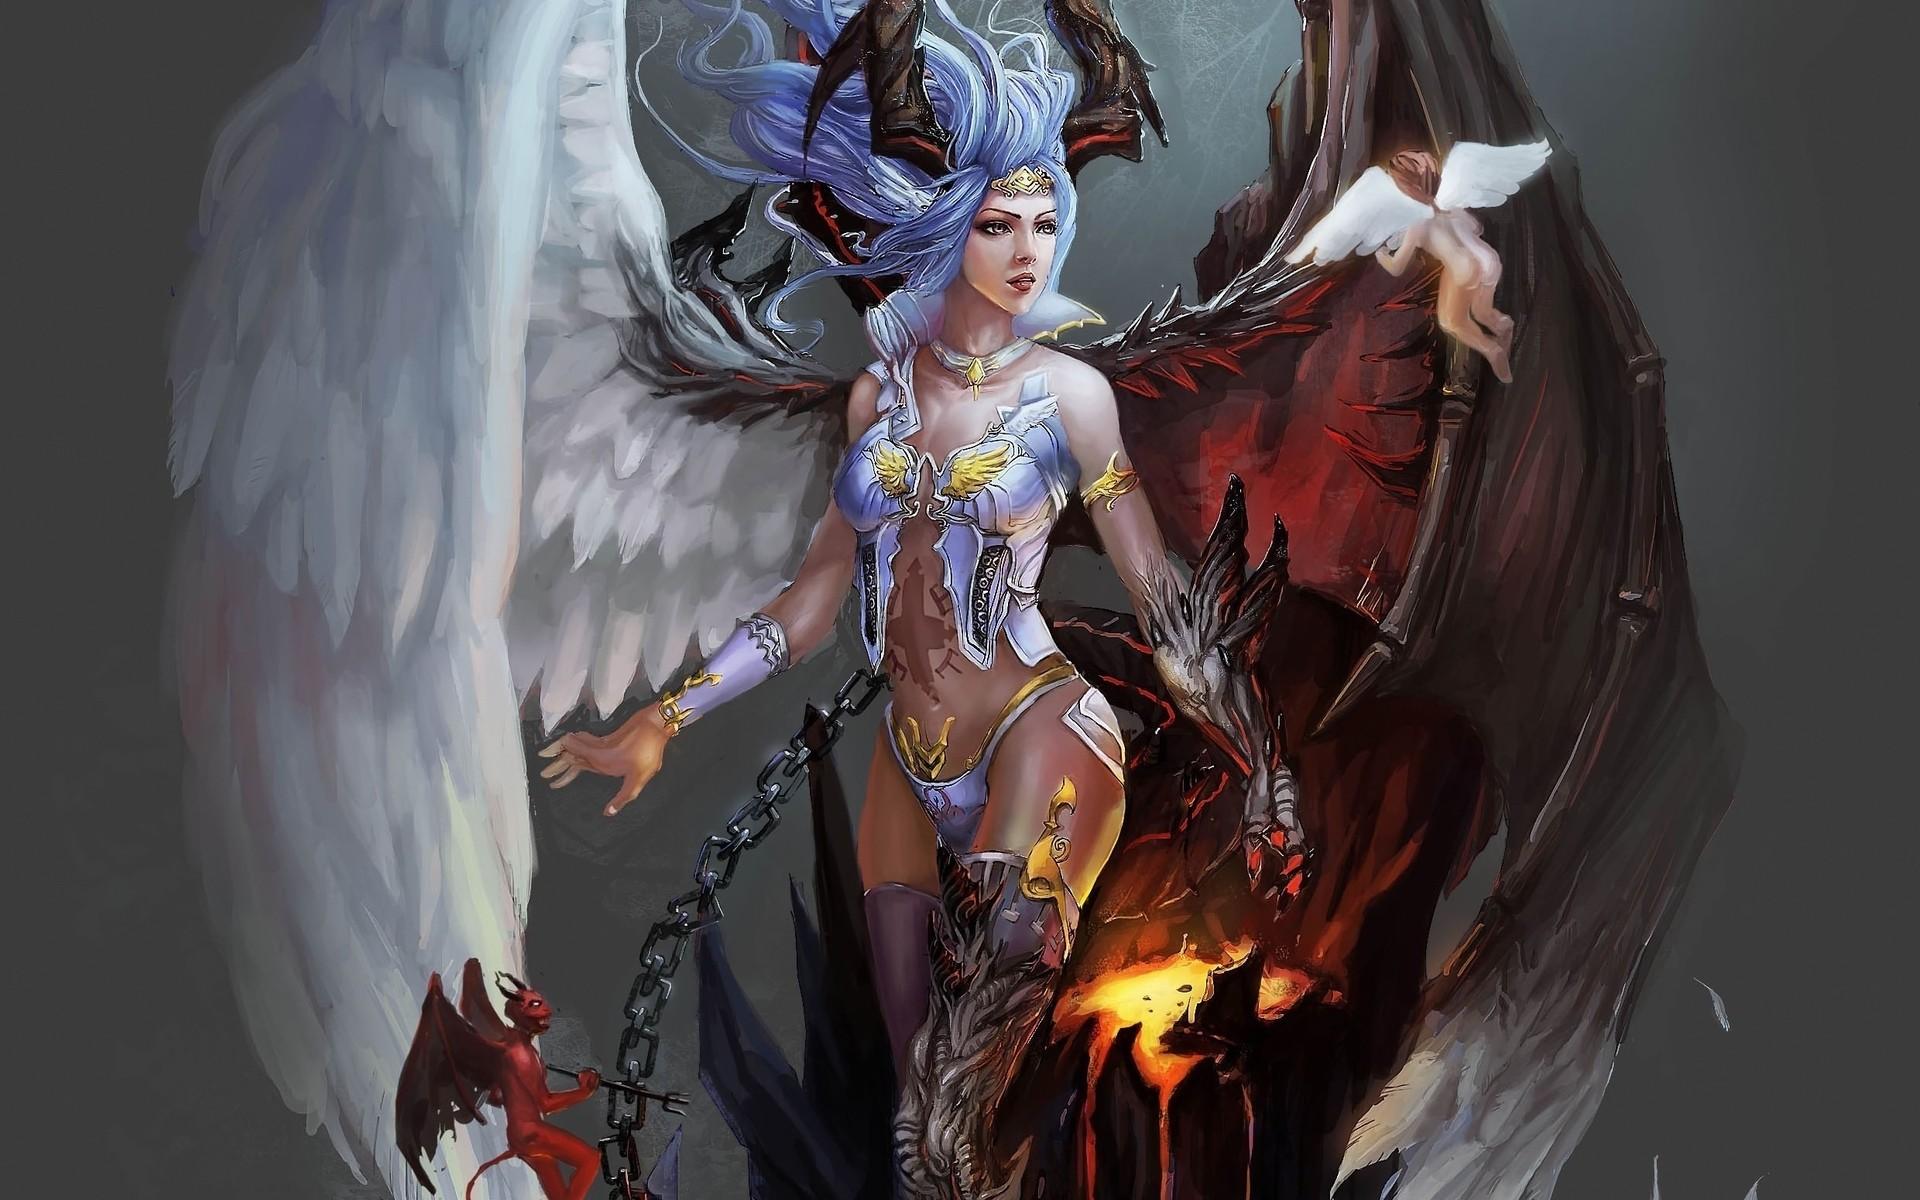 Res: 1920x1200, Fantasy demon angel wings chains fire magic good evil god goddess art  wallpaper |  | 27380 | WallpaperUP